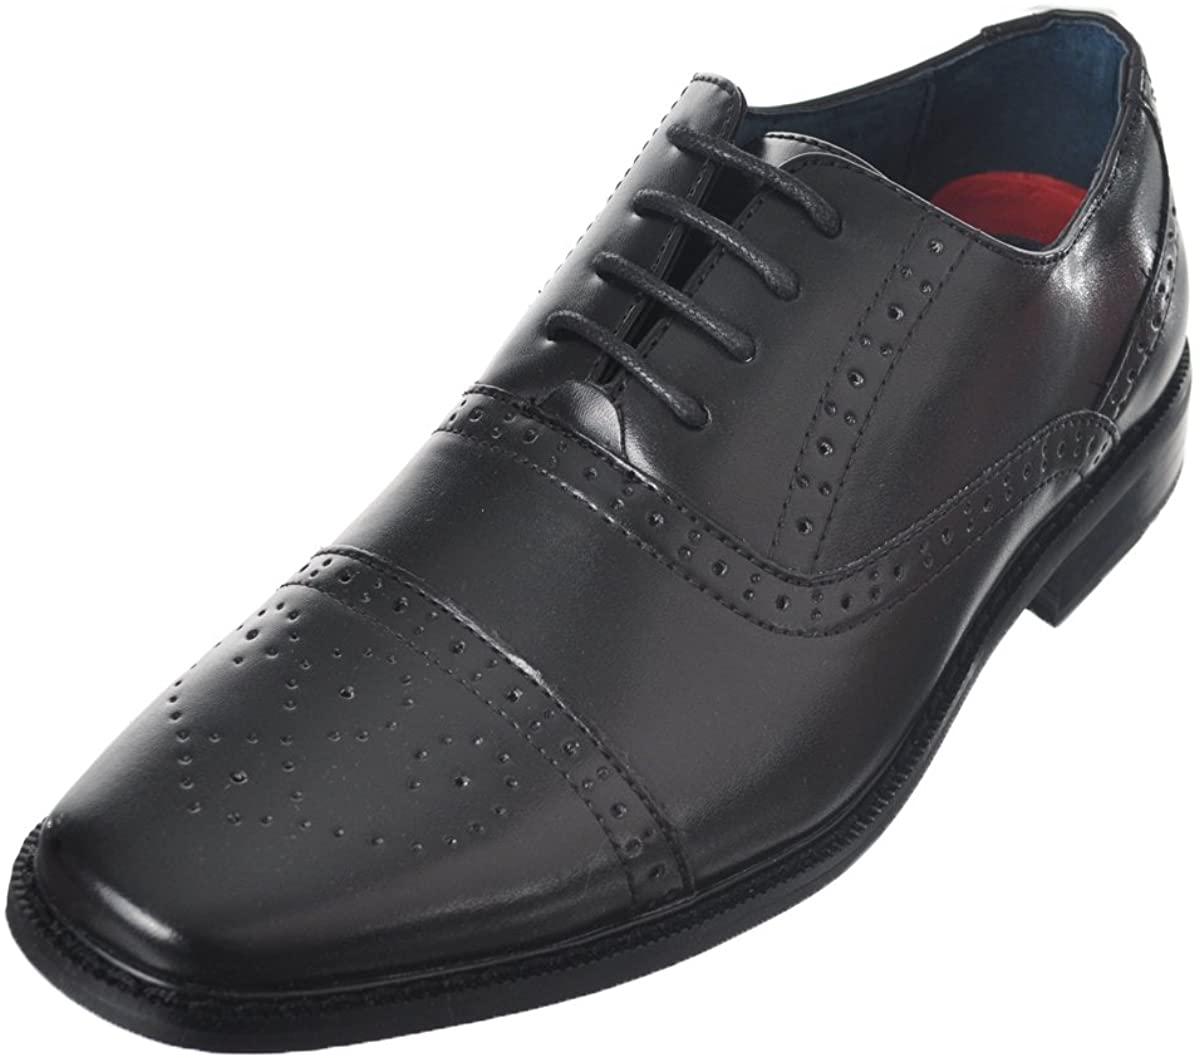 Joseph Allen Boys Worsted Flourish Dress Shoes